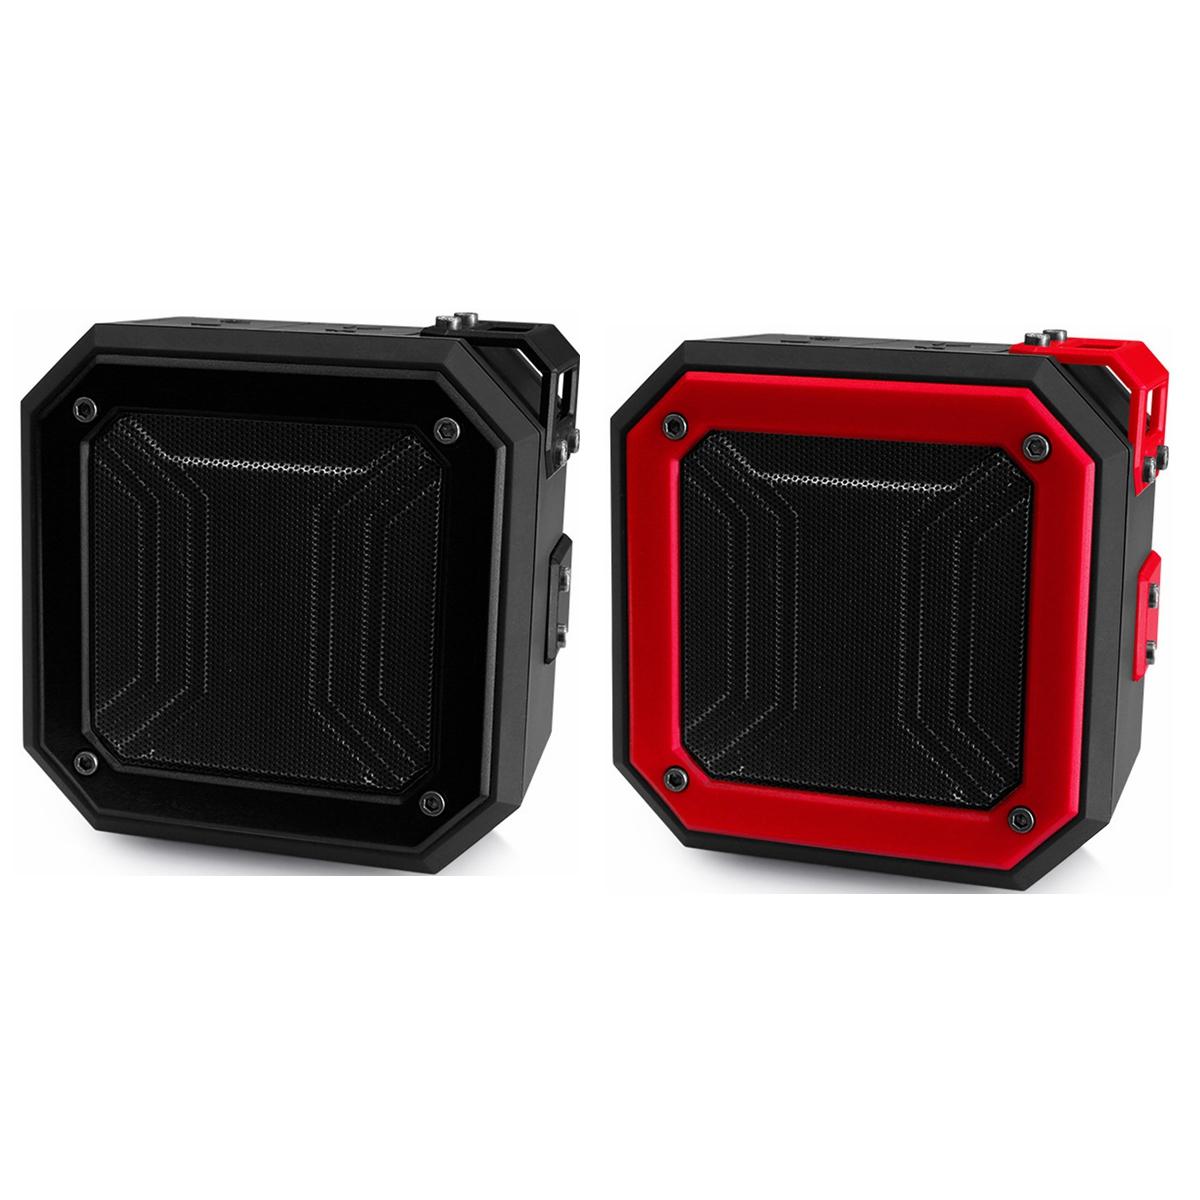 Wireless Bluetooth Speaker Bluetooth 5.0 1200mah Outdoor Speaker Hands Free Call FM Radio TWS Connection